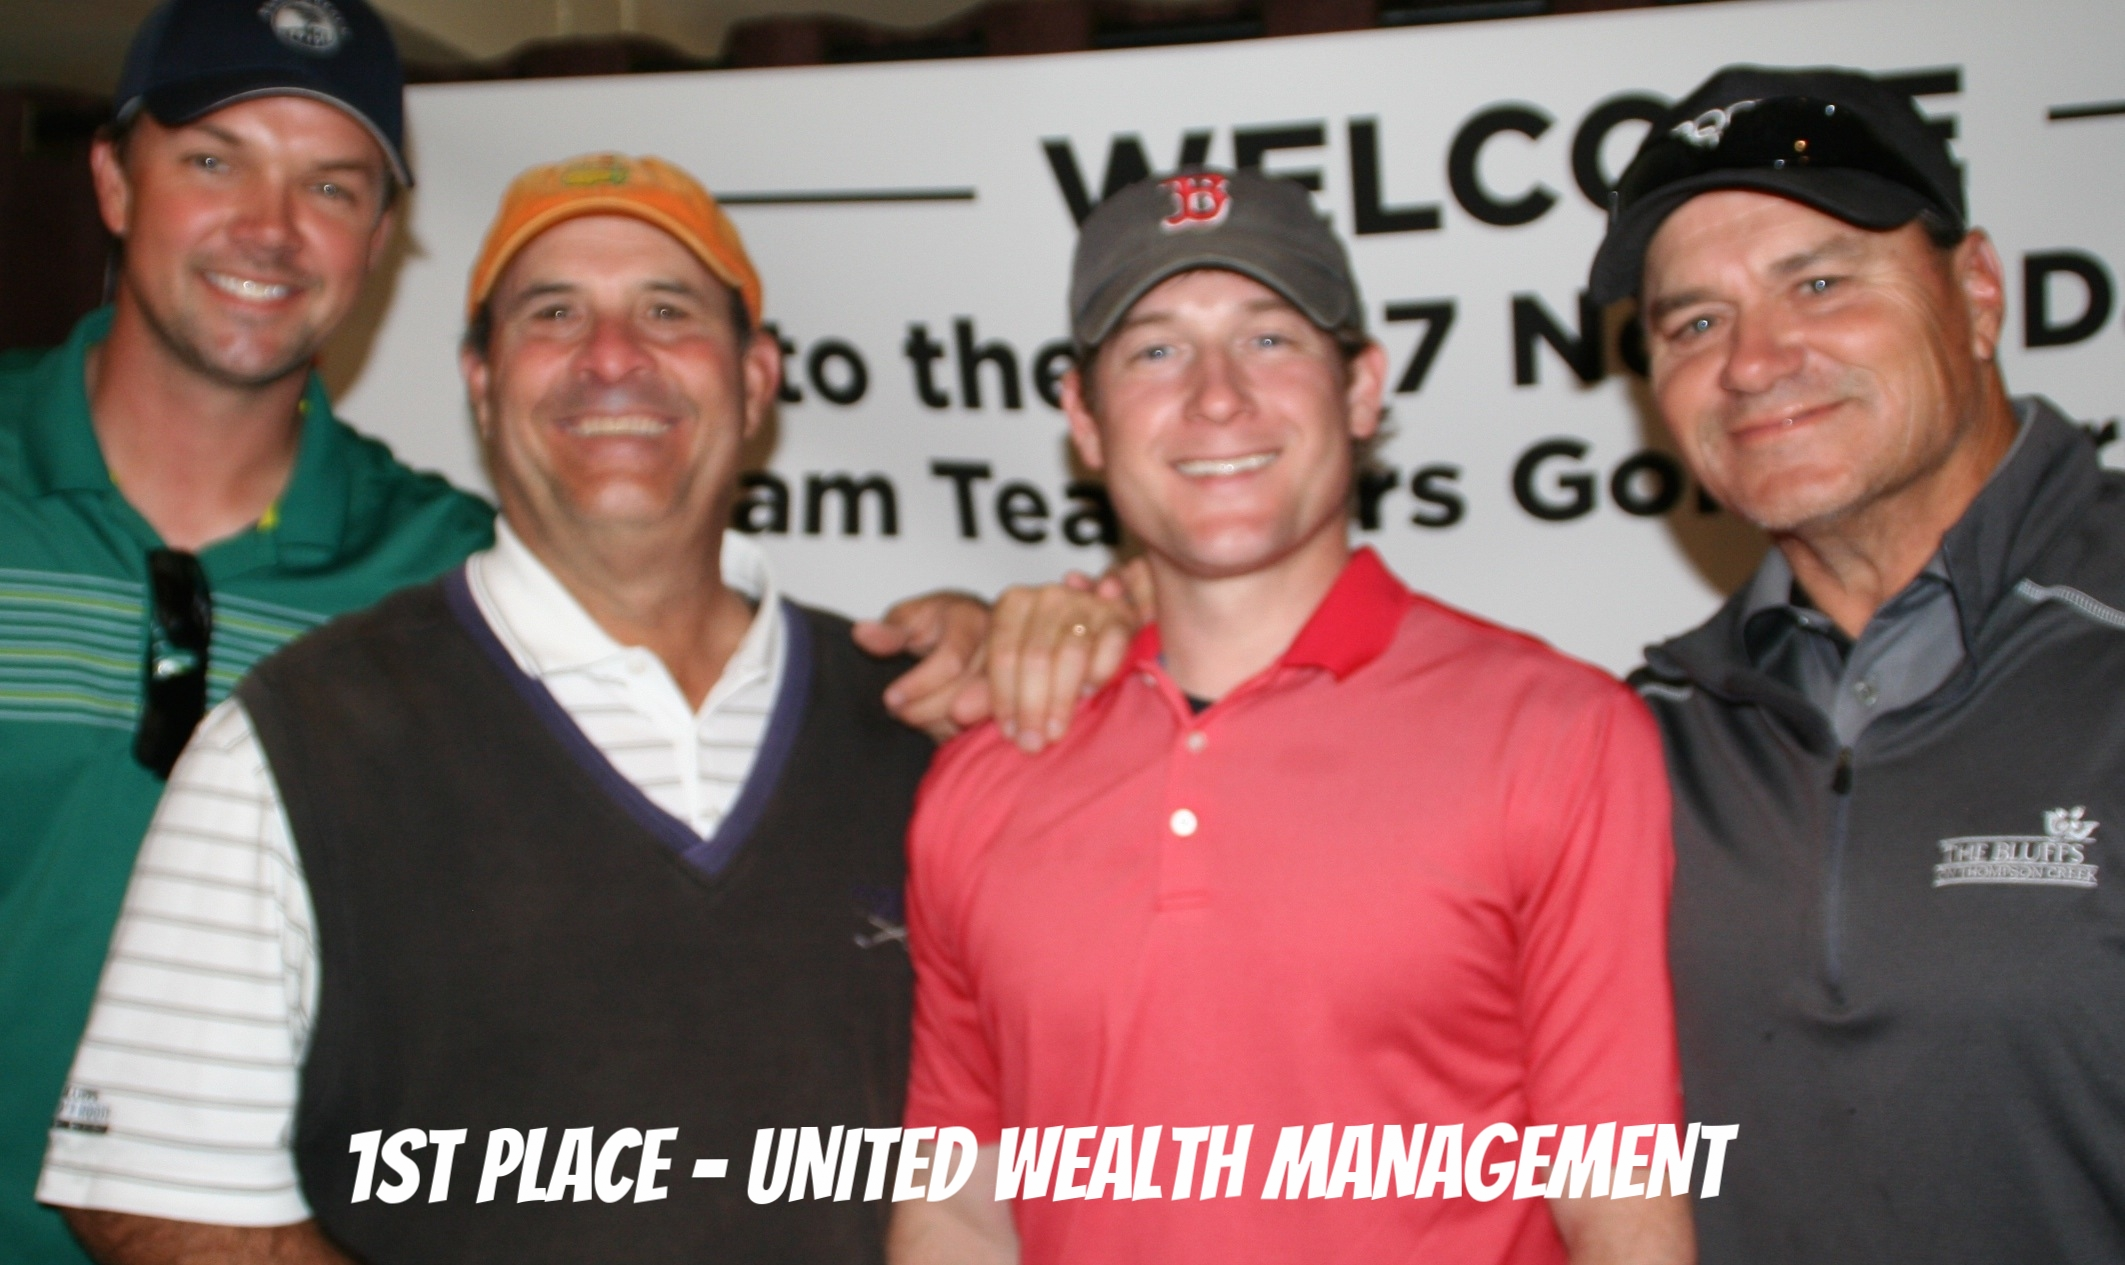 1st Place Team - United Wealth Management